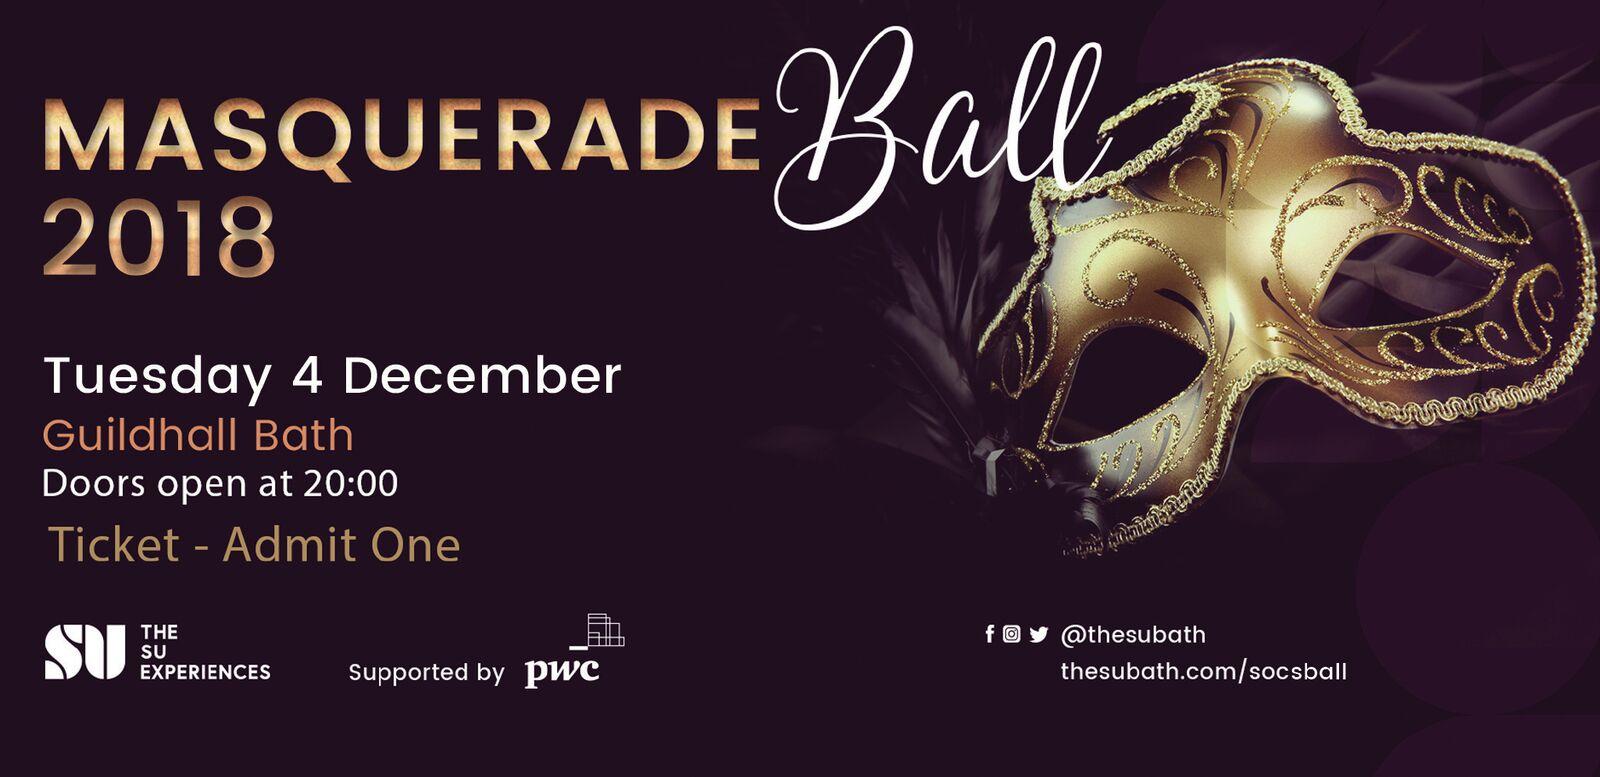 gamme complète de spécifications performance fiable design distinctif Societies Masquerade Ball 2018